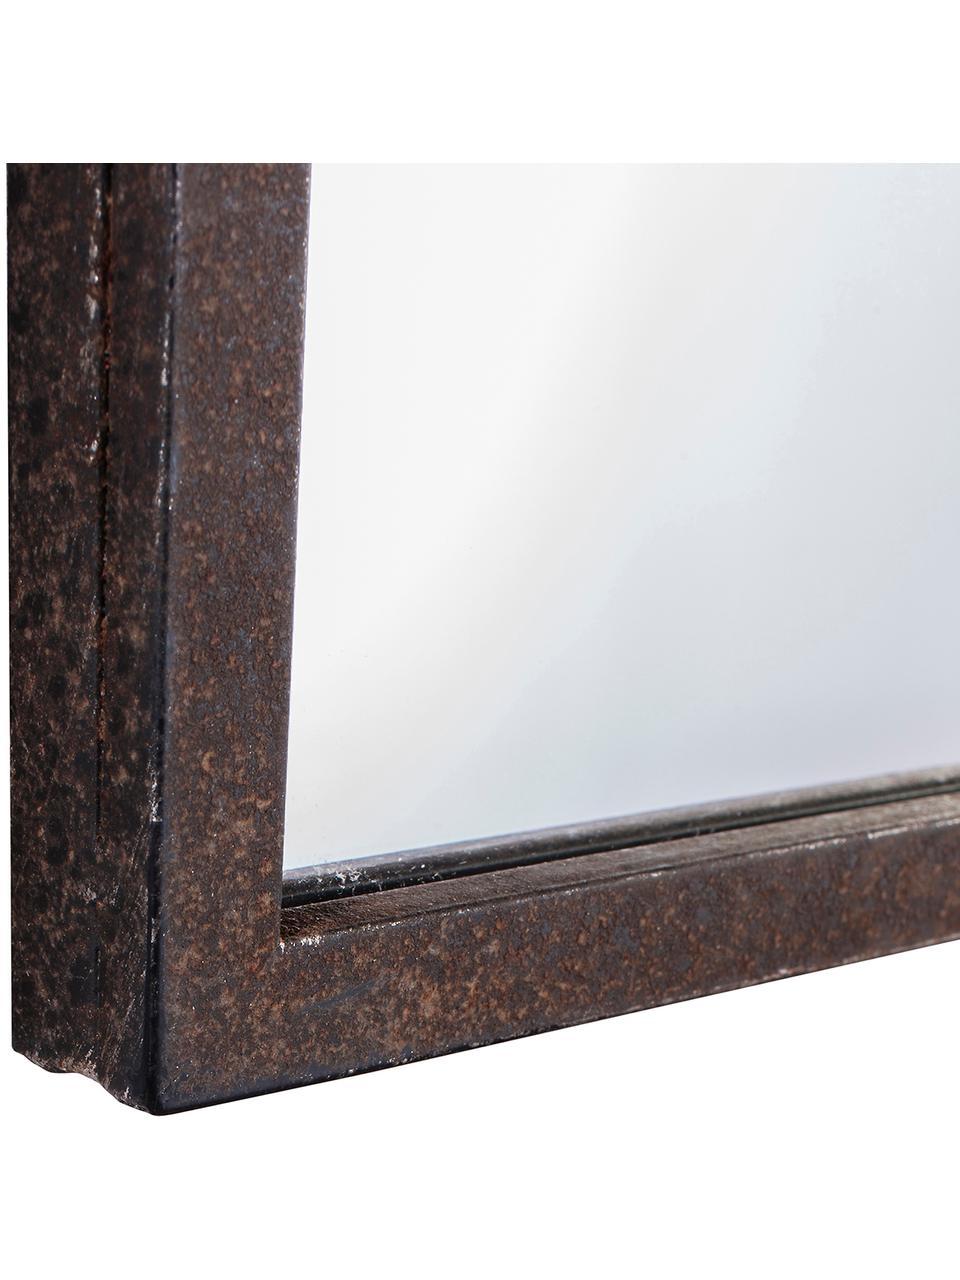 Metall-Wandspiegel Rockford, Rahmen: Metall, lackiert, Spiegelfläche: Spiegelglas, Schwarz, 91 x 76 cm